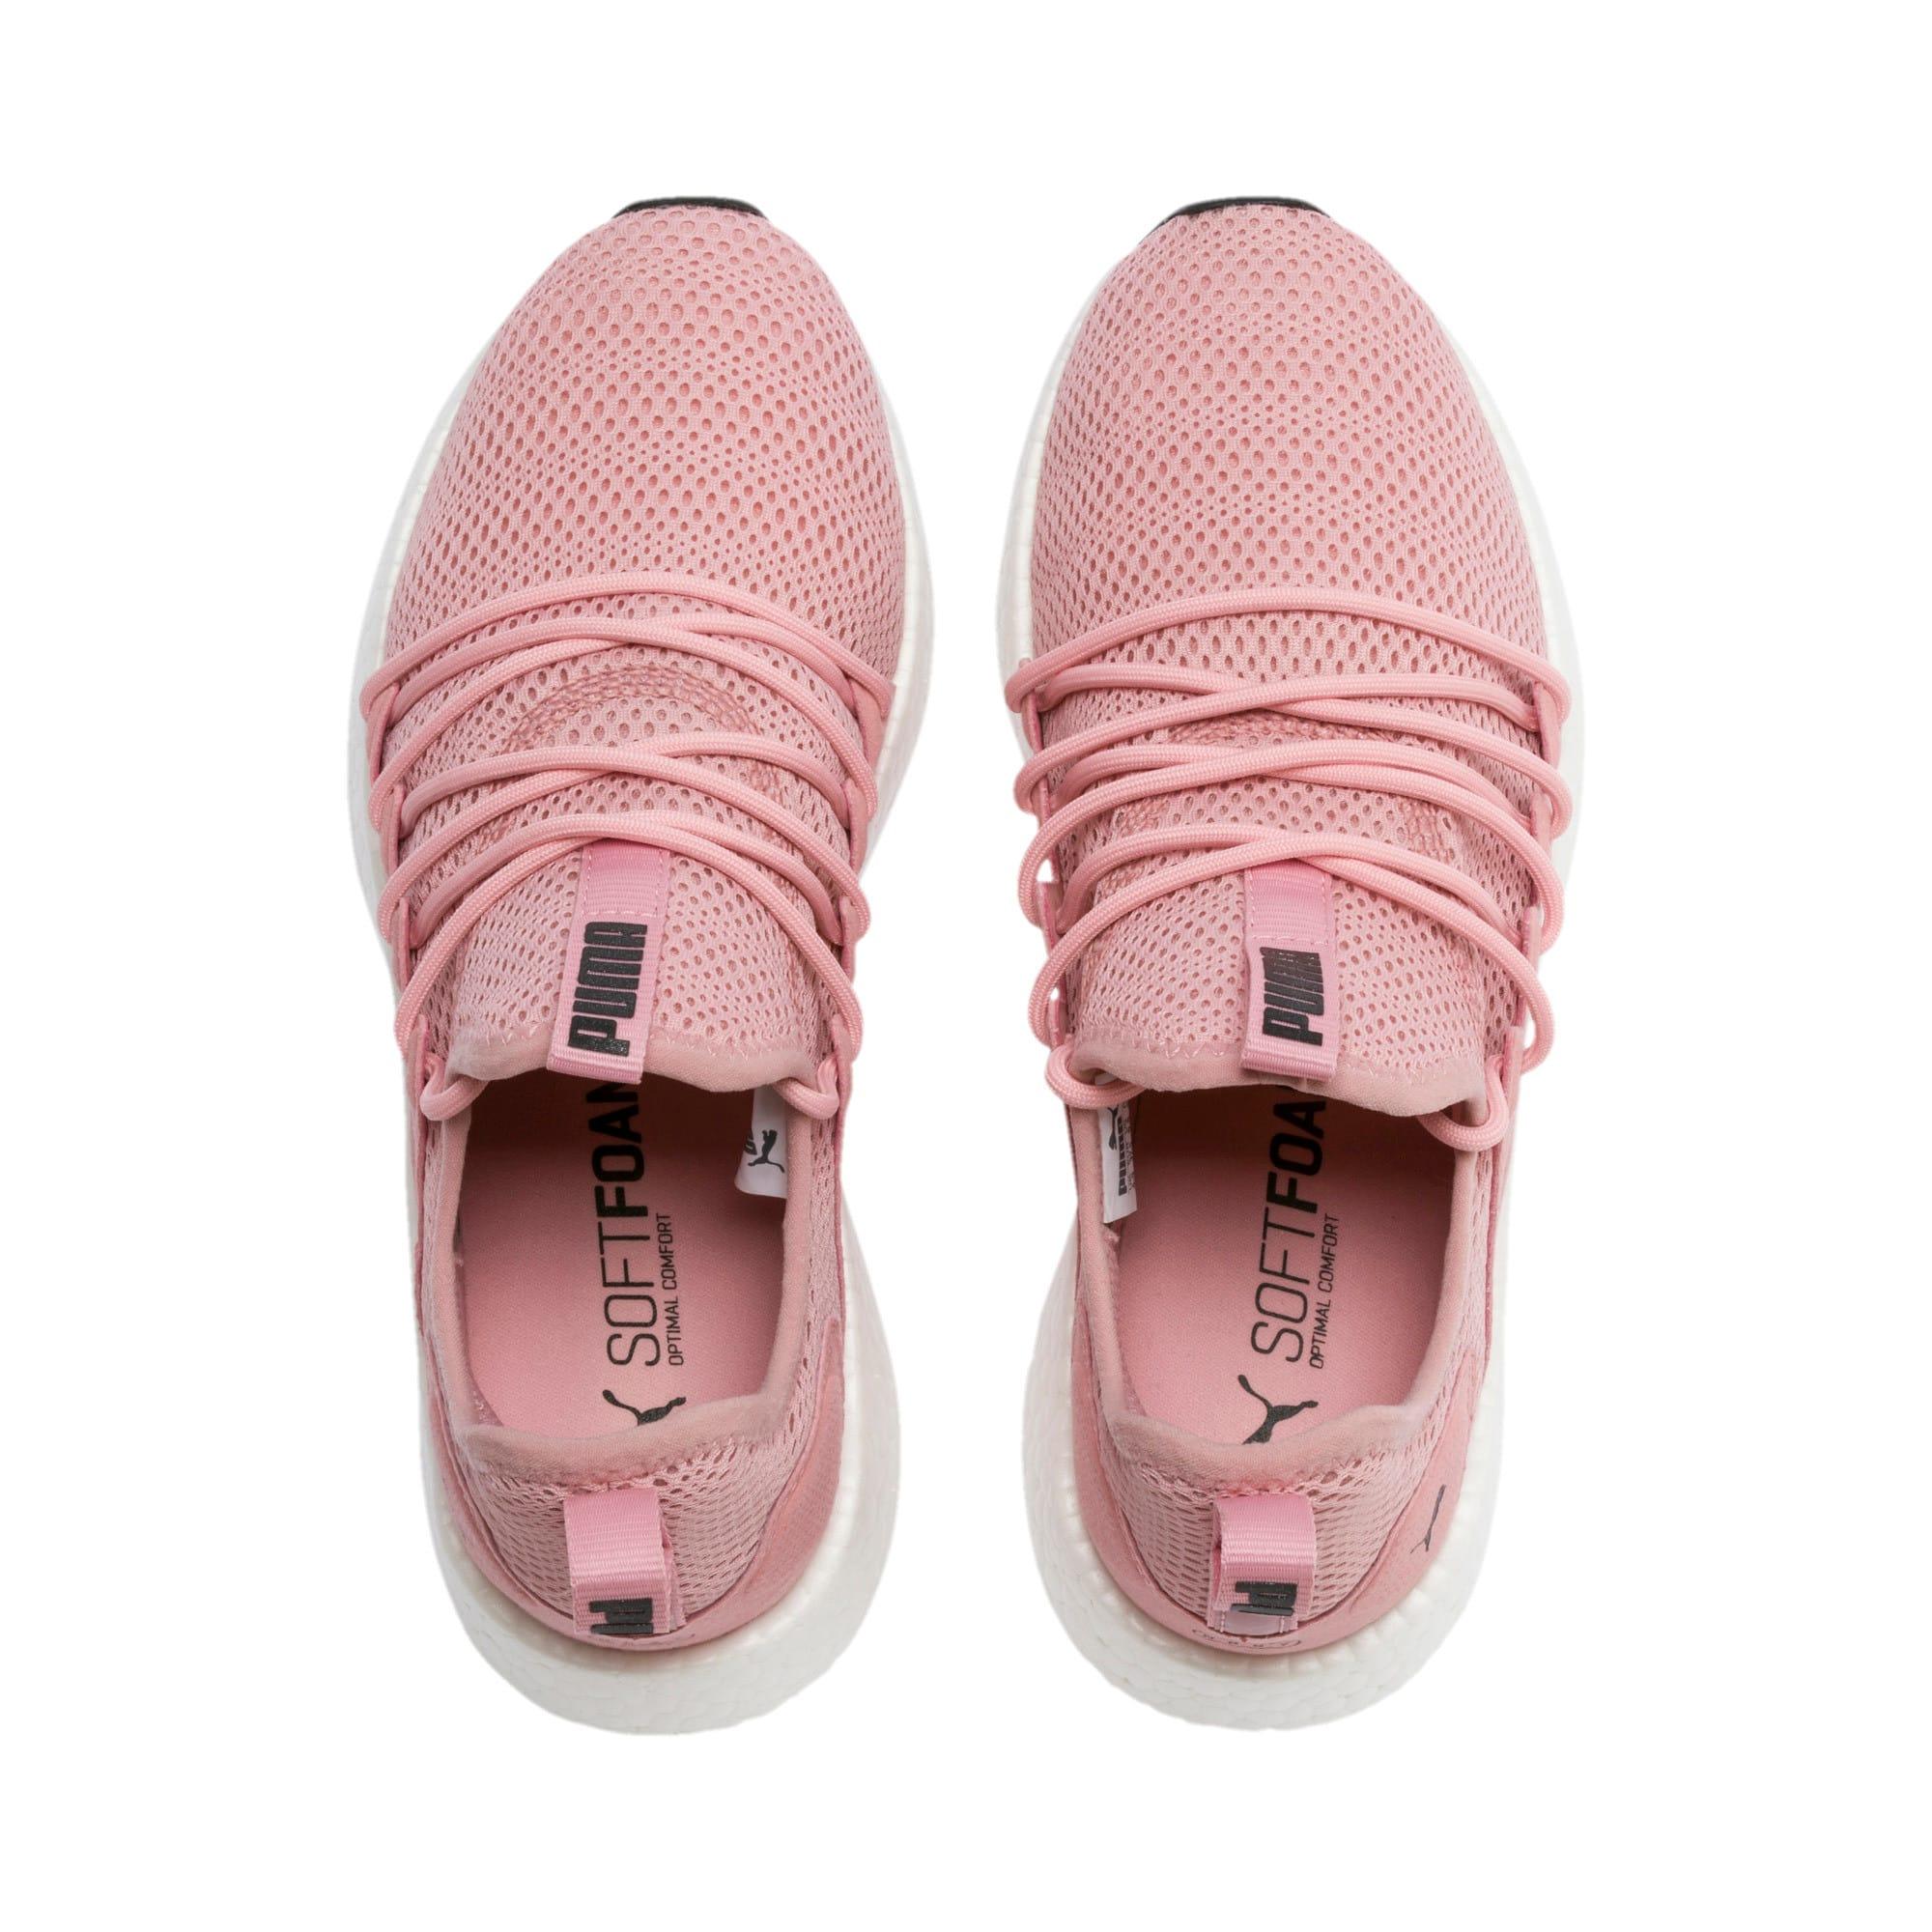 Thumbnail 7 of NRGY Neko Shift Women's Running Shoes, Bridal Rose-Puma White, medium